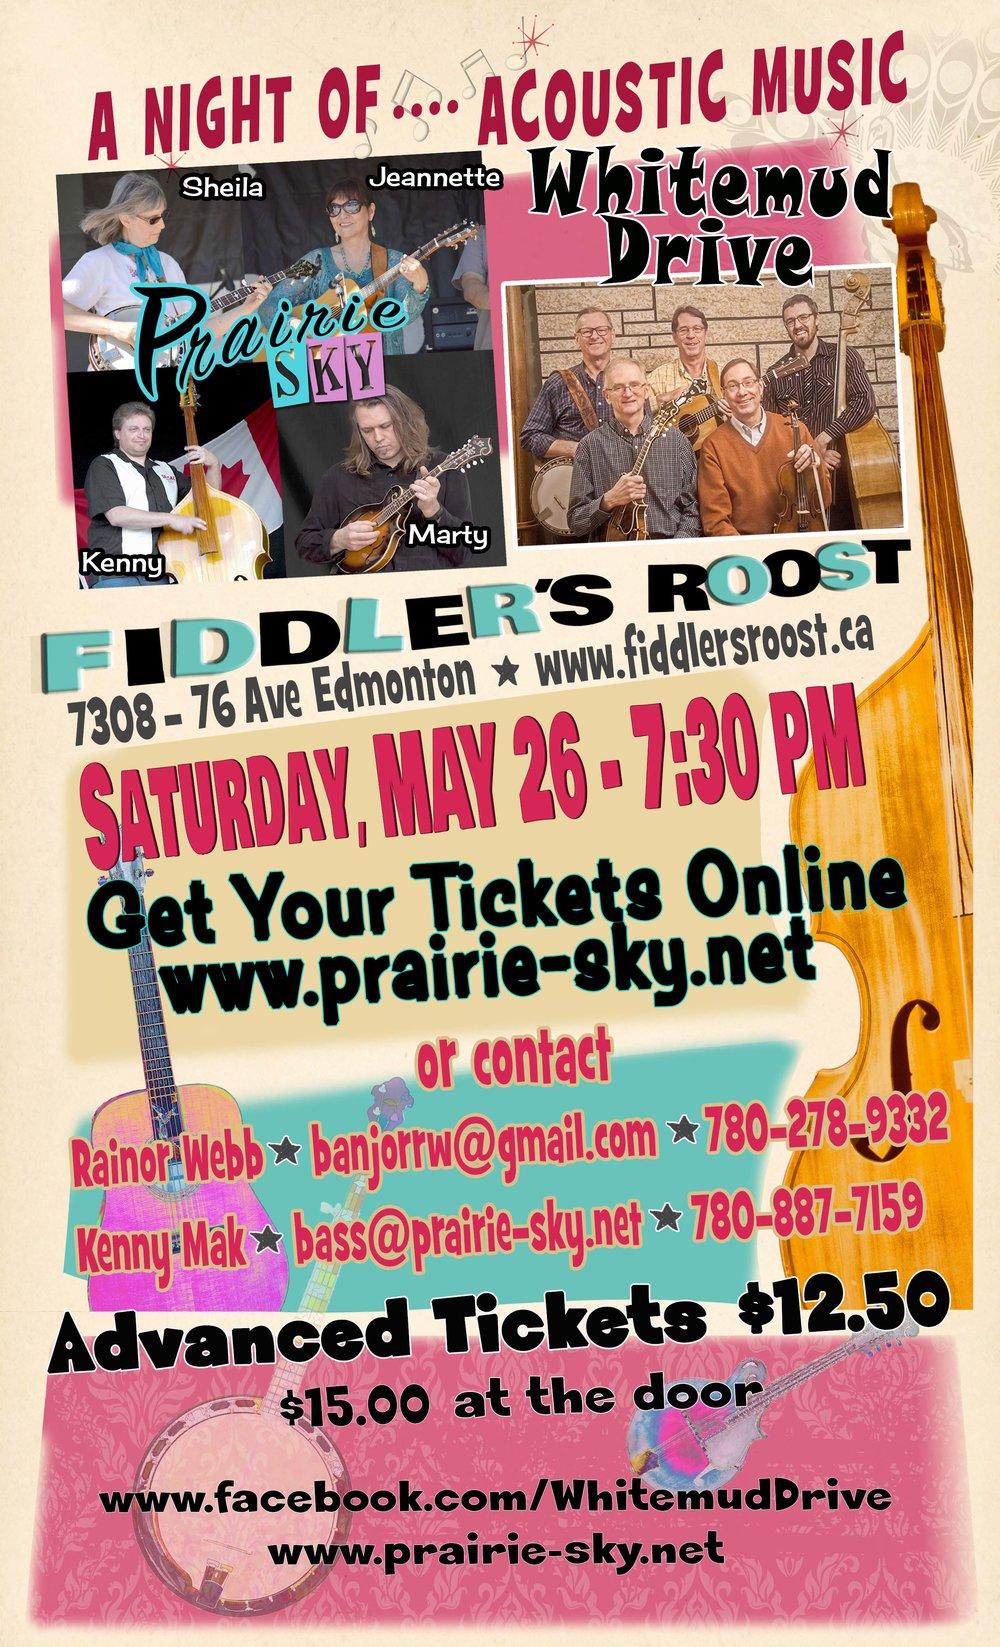 Blueberry Bluegrass Festival - Prairie Sky & Whitemud Drive Concert